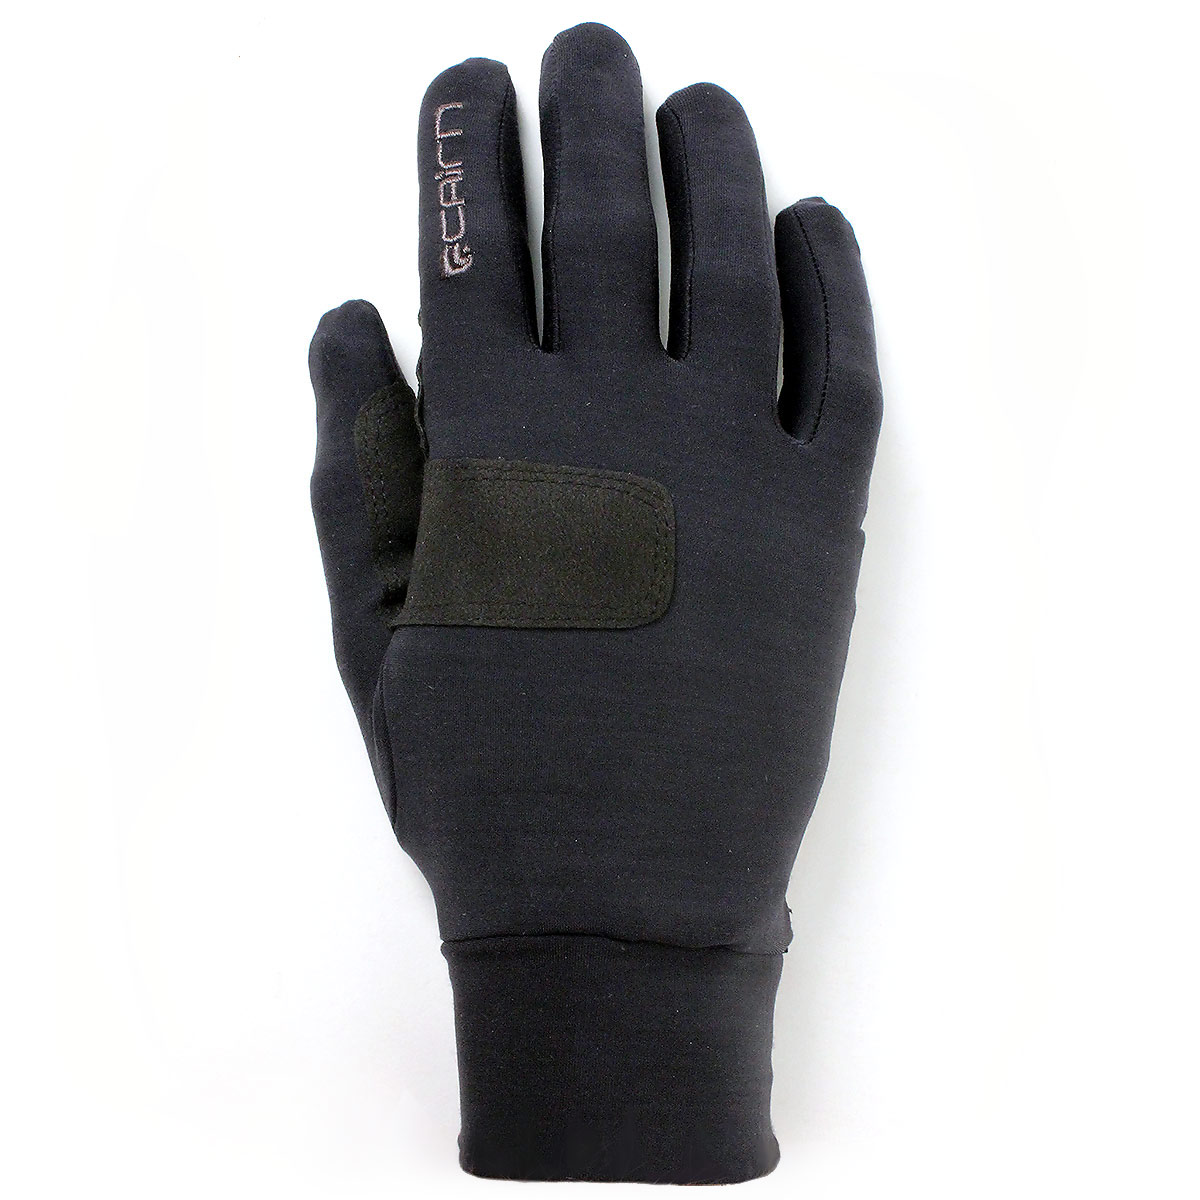 gants cairn softex amara noir gant moto scooter japauto. Black Bedroom Furniture Sets. Home Design Ideas